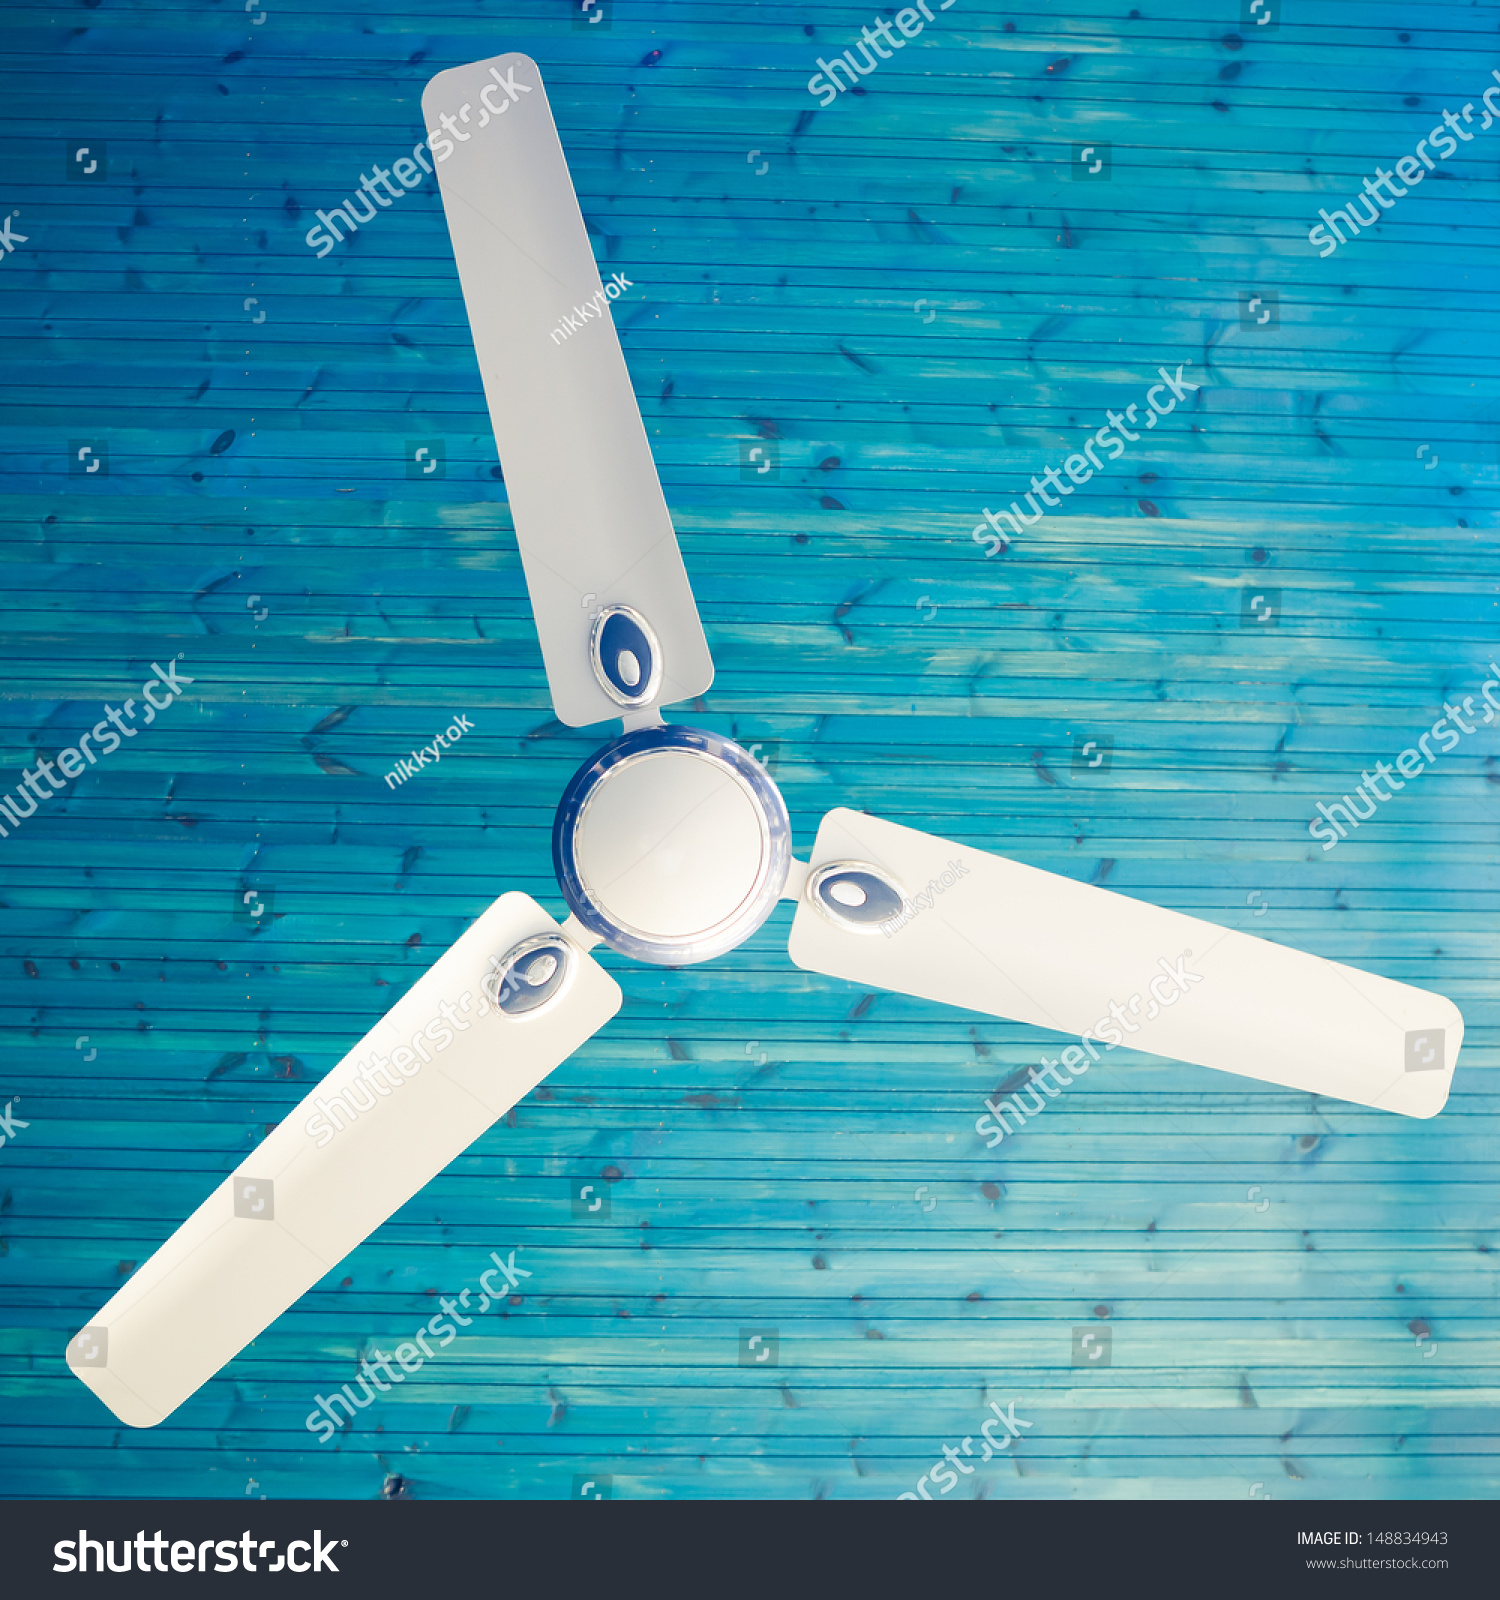 ceiling fan stock photo 148834943 shutterstock. Black Bedroom Furniture Sets. Home Design Ideas